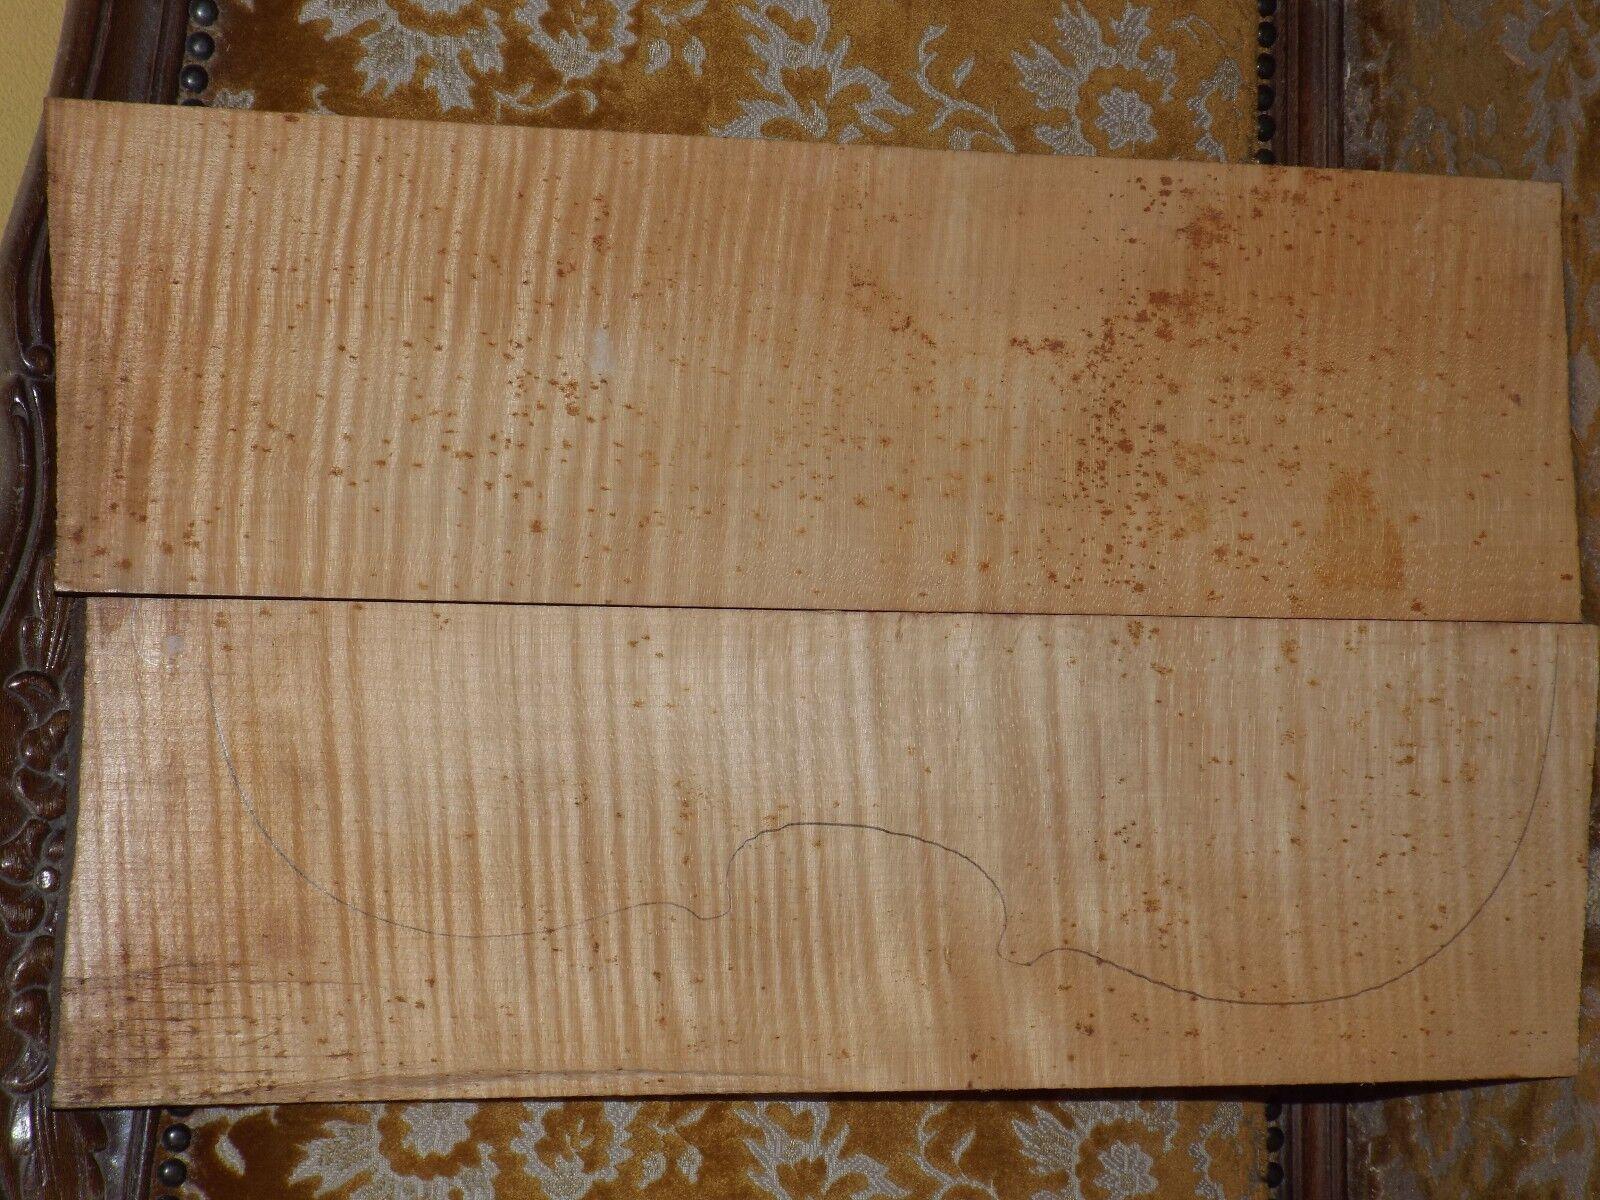 Tonholz, Tonewood, aus Nachlass, Besteens geflammter lilaboden, old lila back